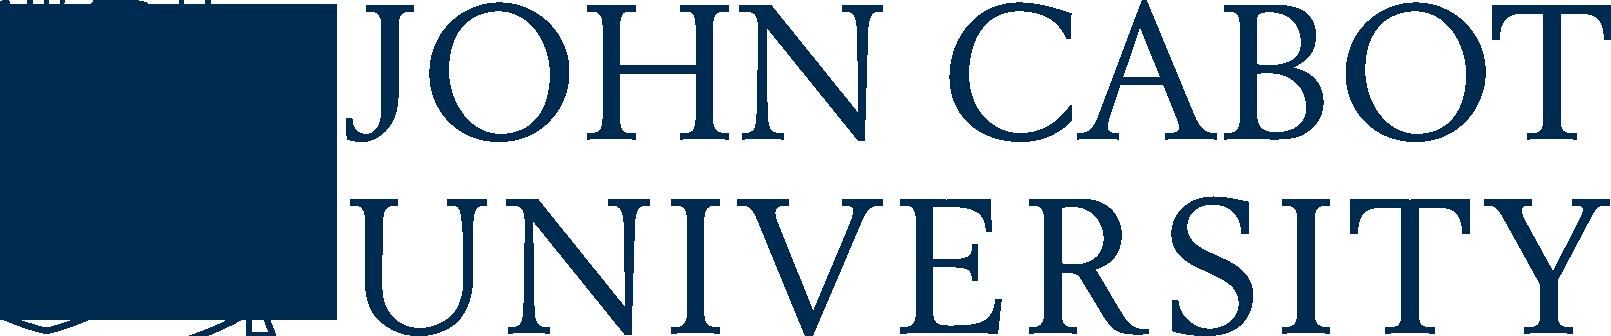 Course Schedules & Syllabi | John Cabot University in Rome